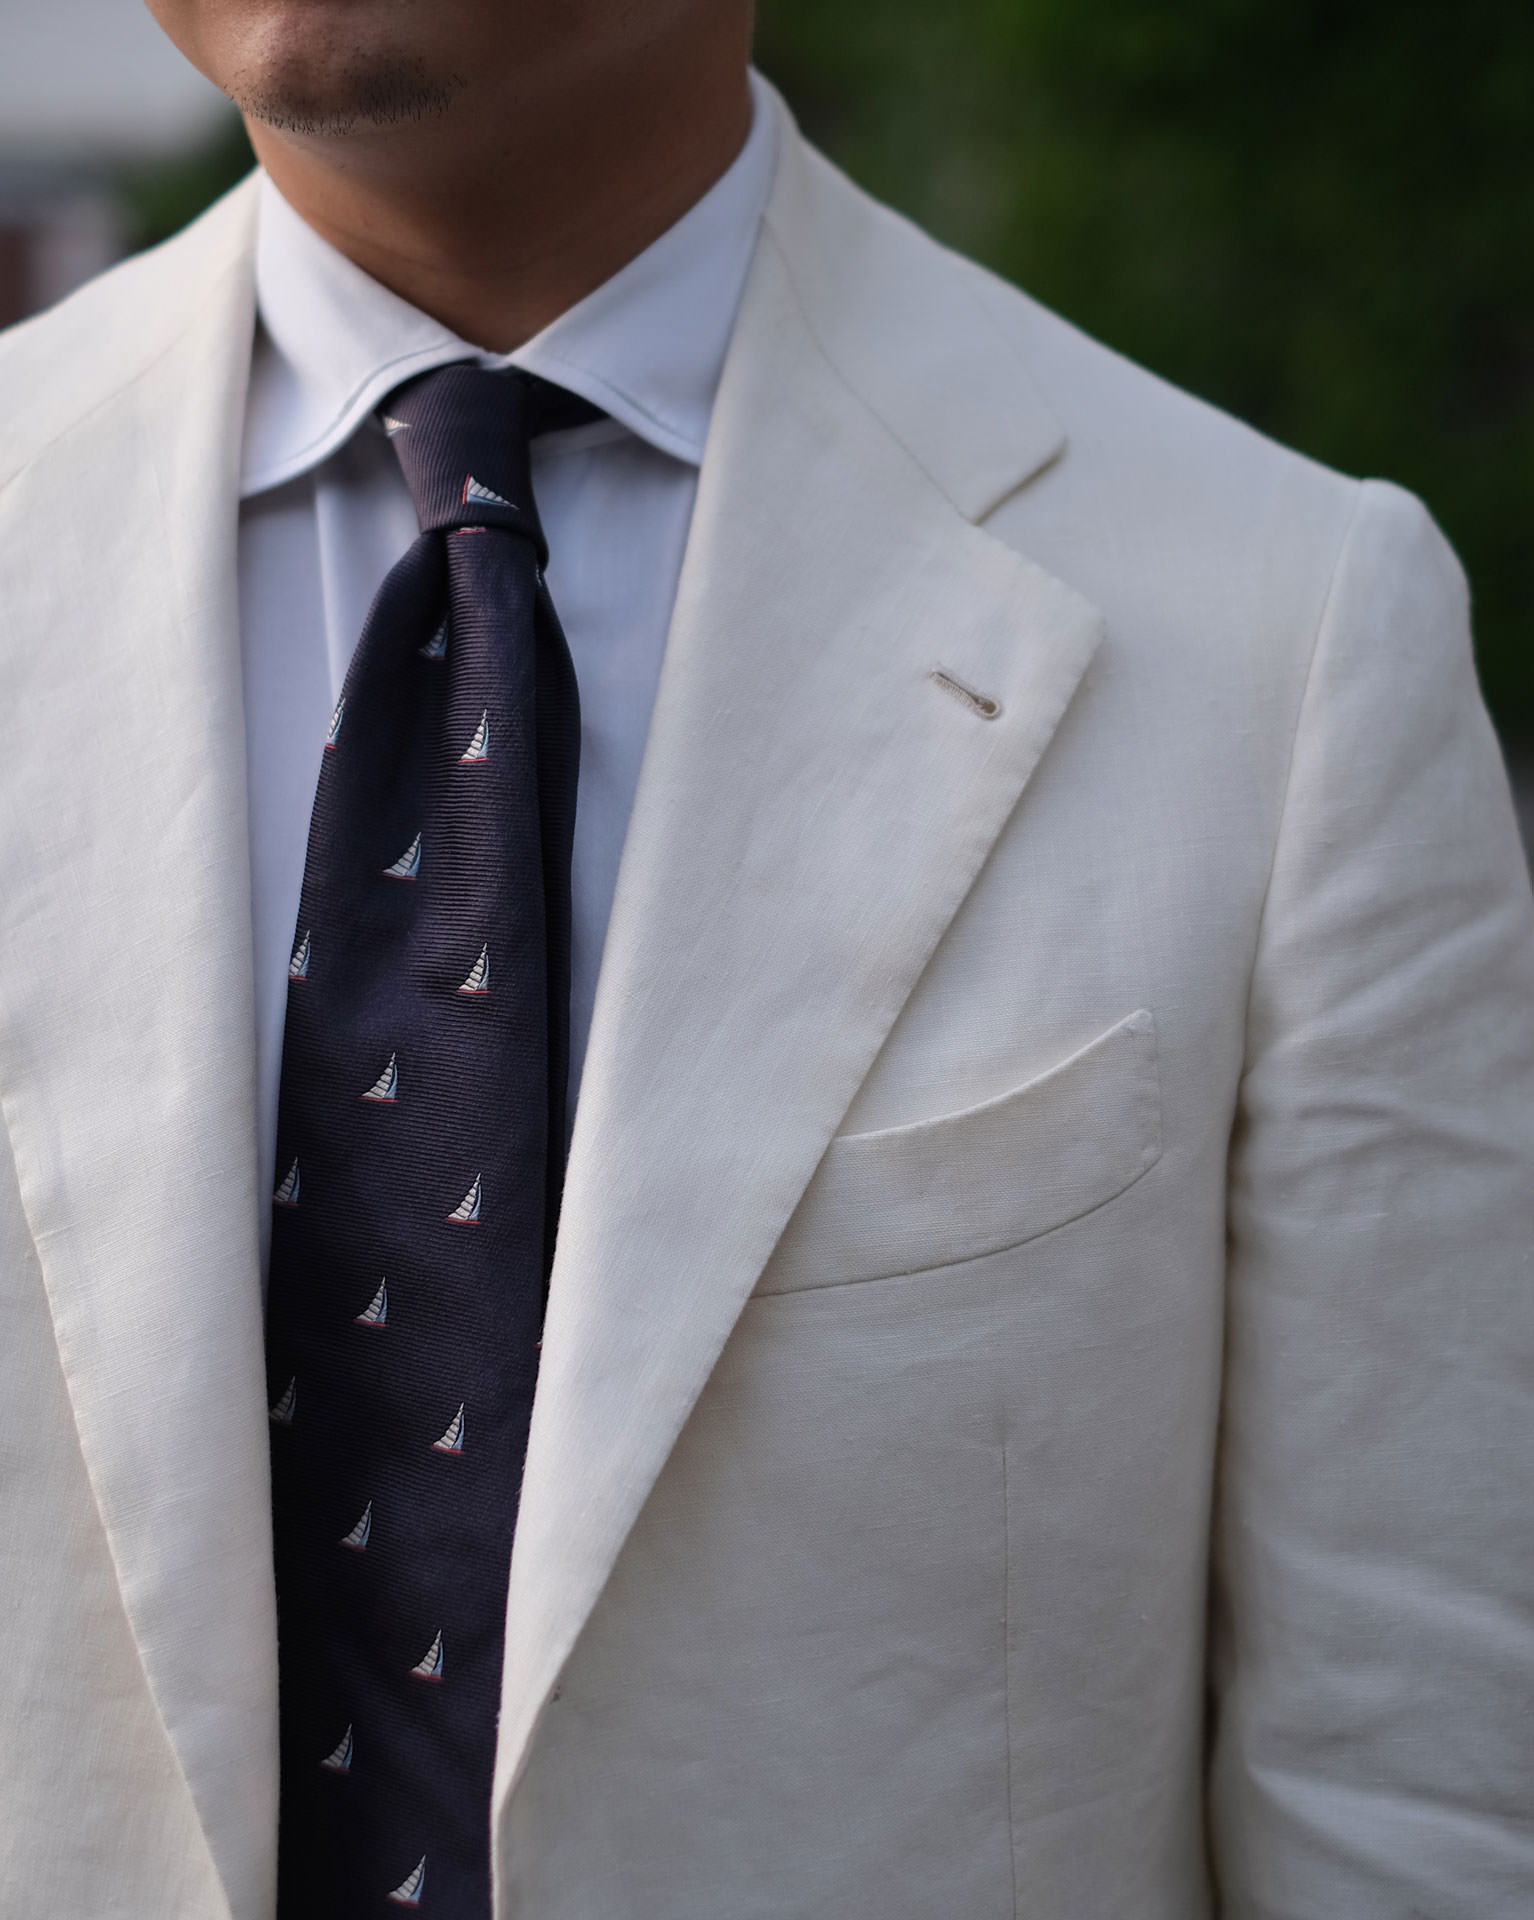 Kamakura Shirt - Spread Collar